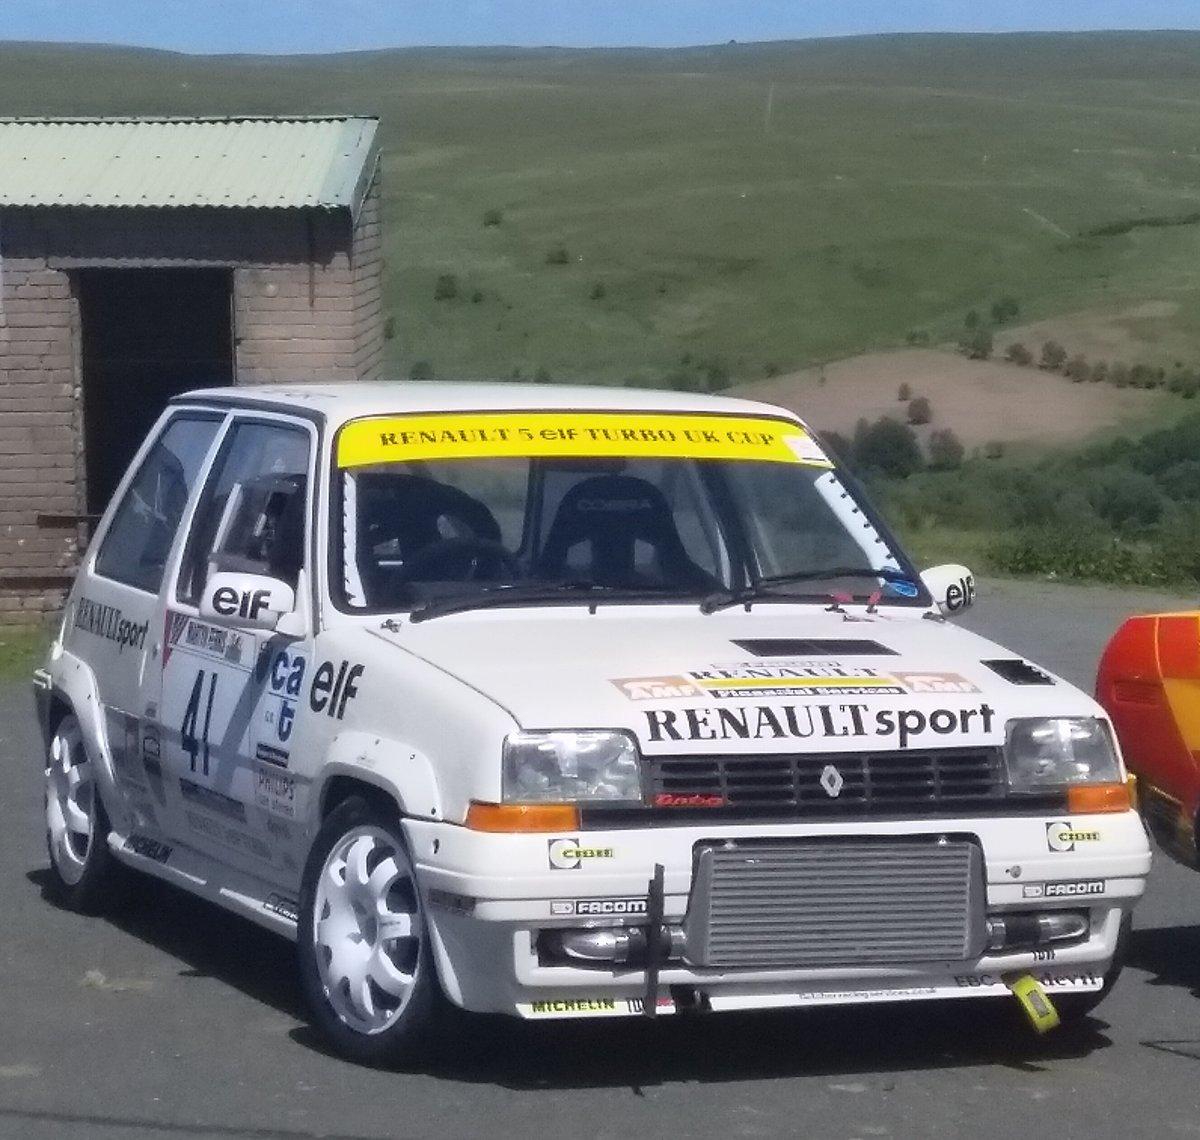 1990 Hillclimb Car. For Sale